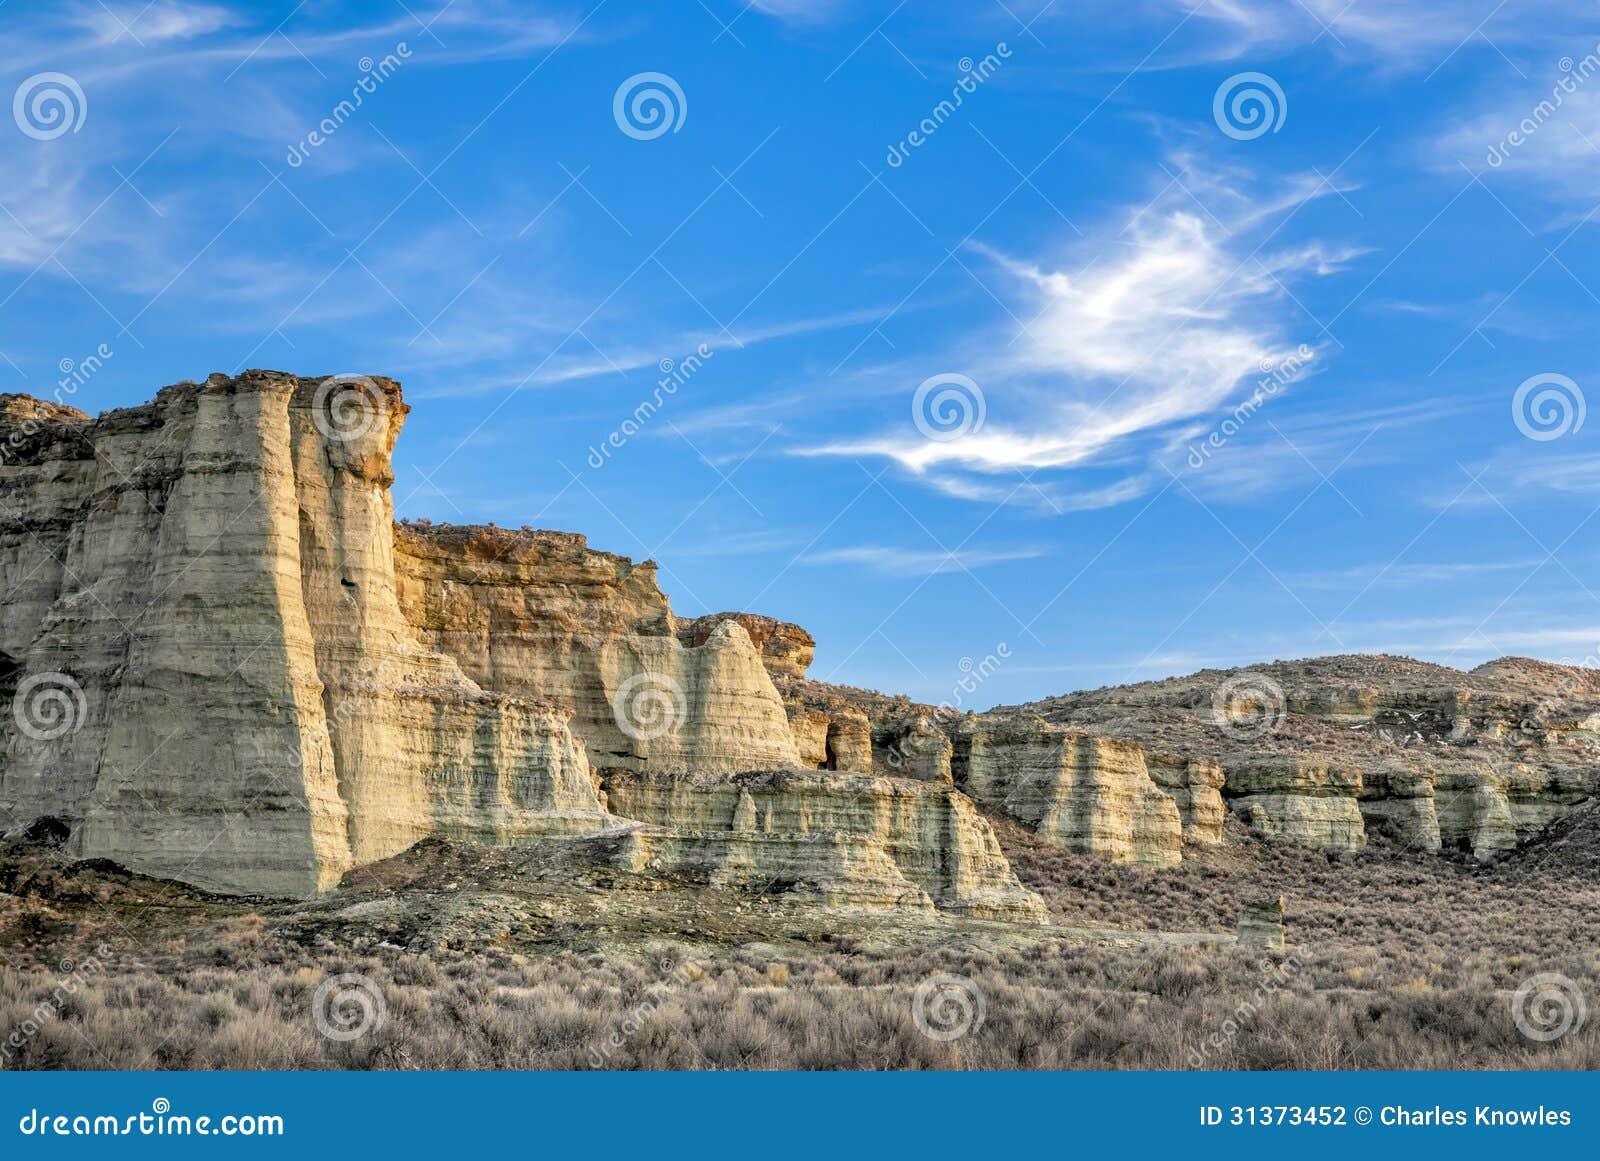 Desert Rock Pillars : Rock pillars in the western desert at sunset stock